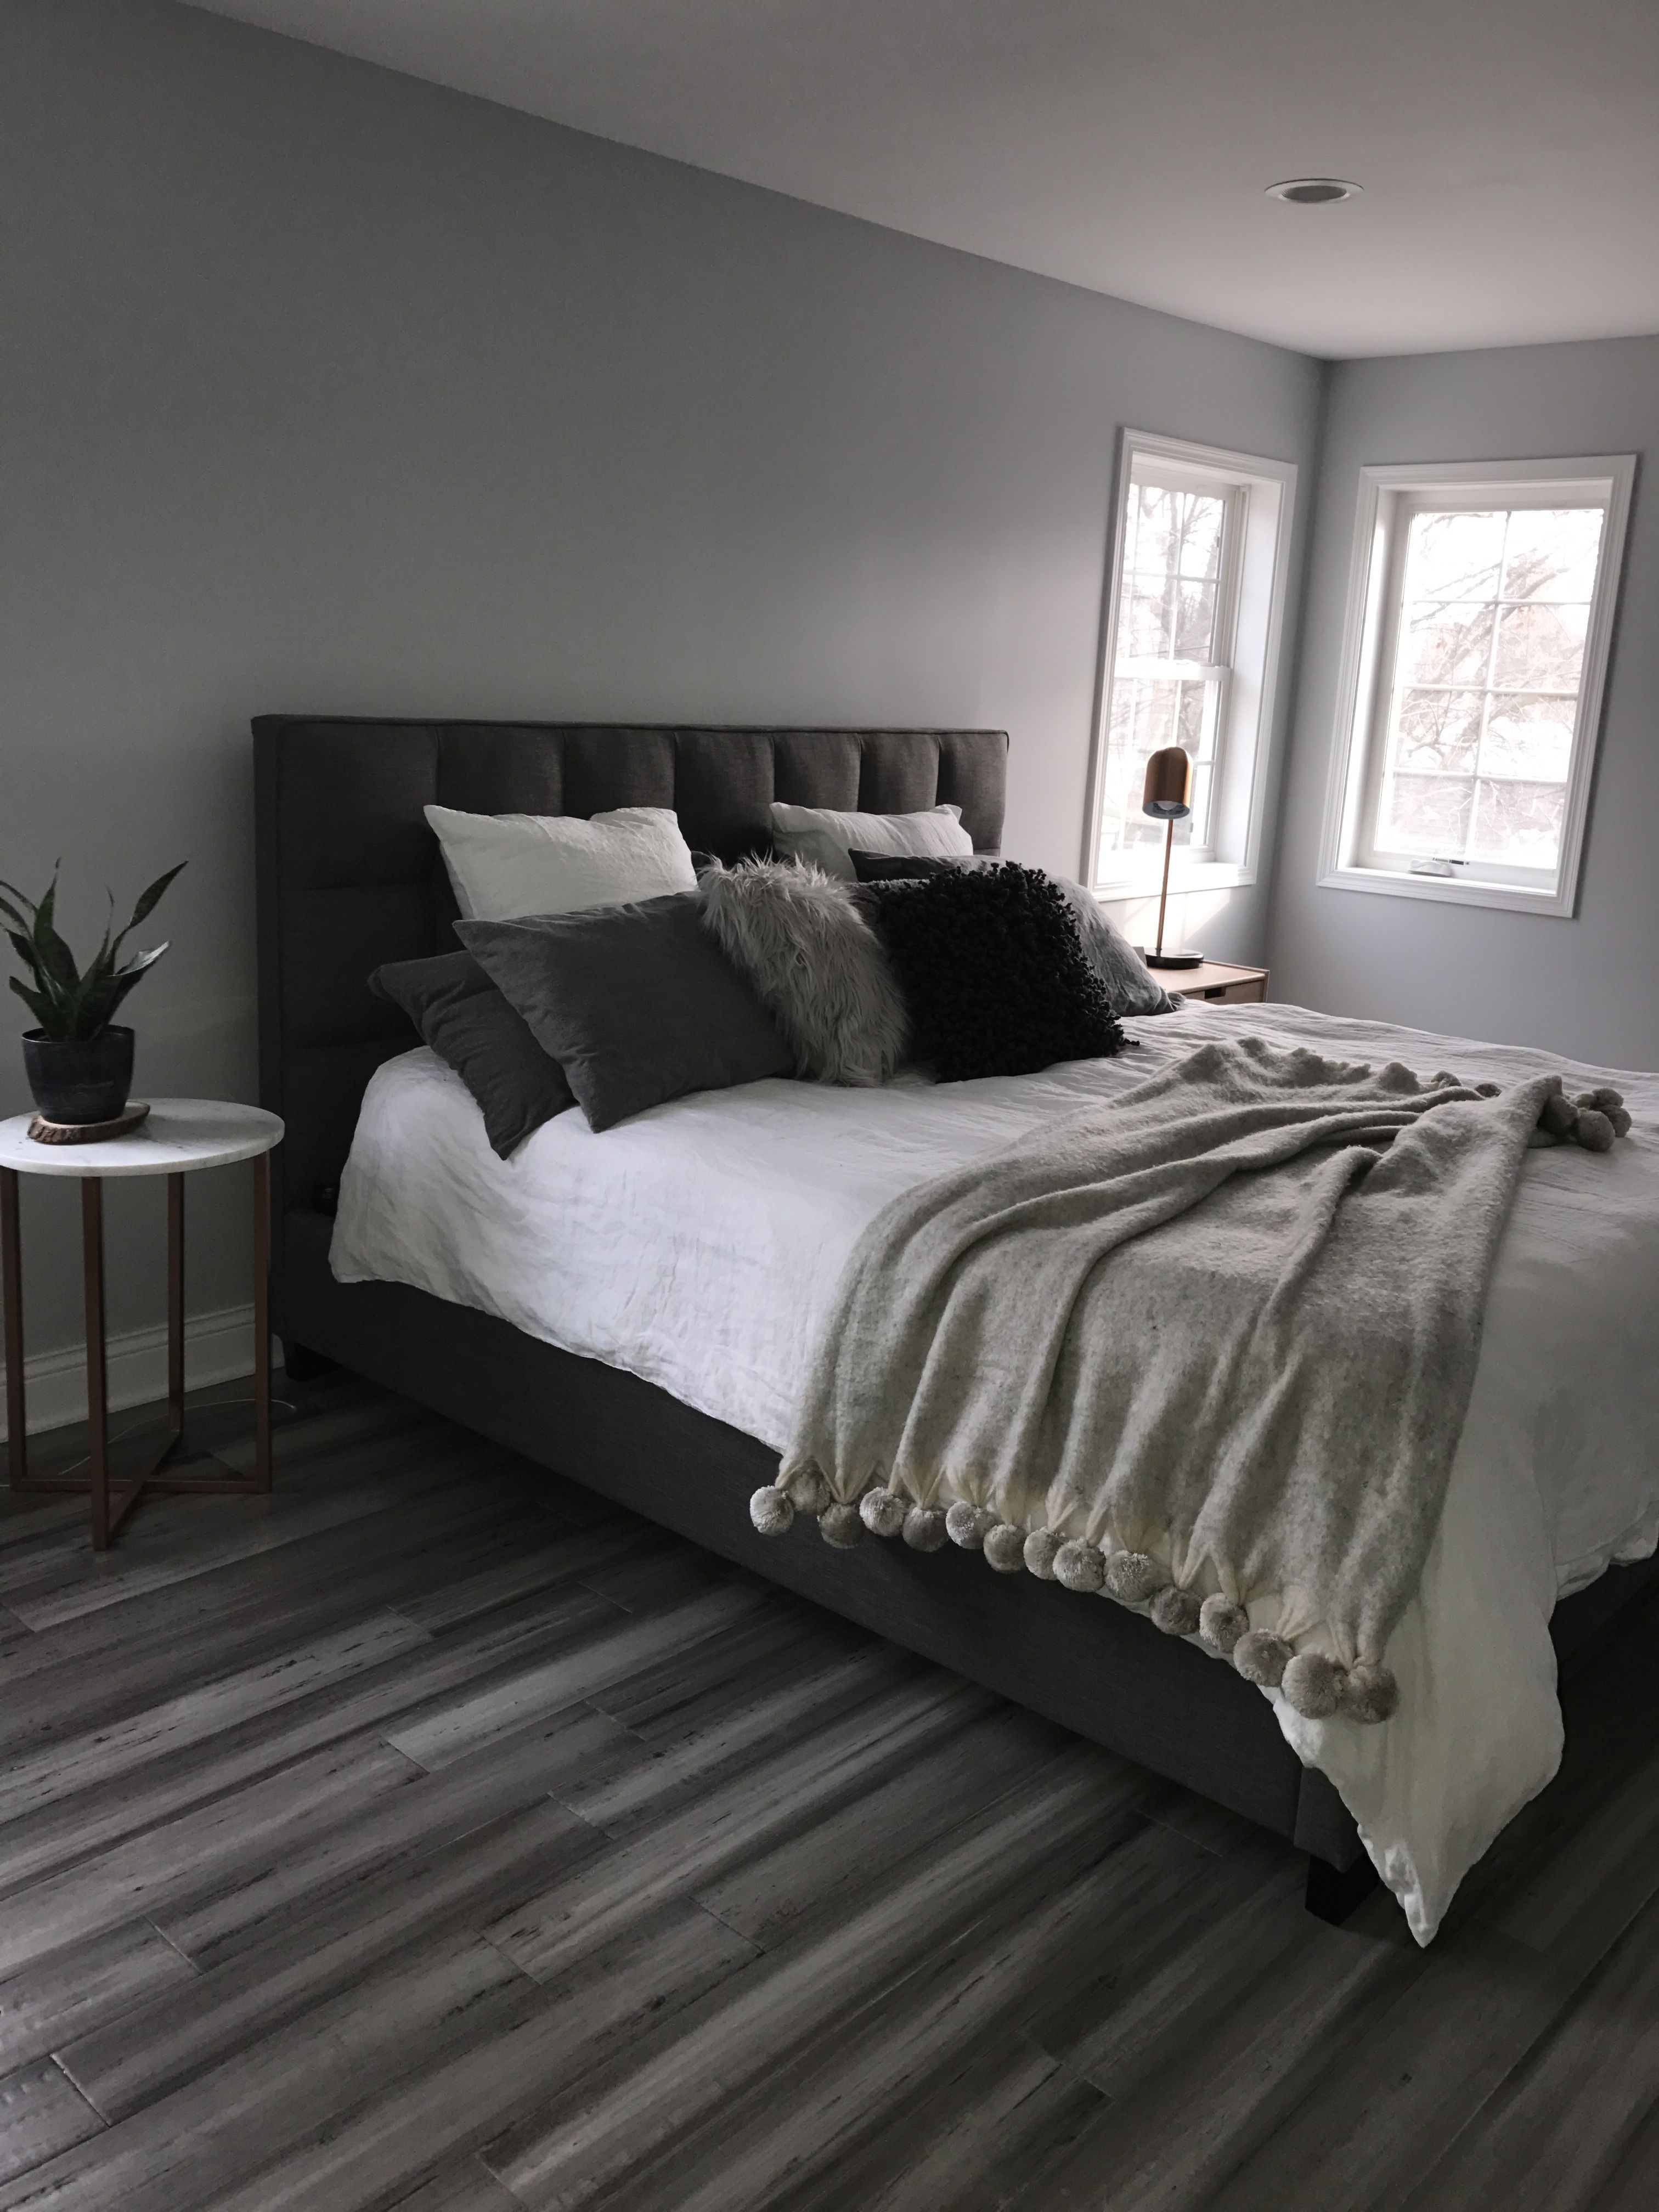 48 Comfy Grey Bedroom Remodel Ideas - DECOONA in 2020 ...